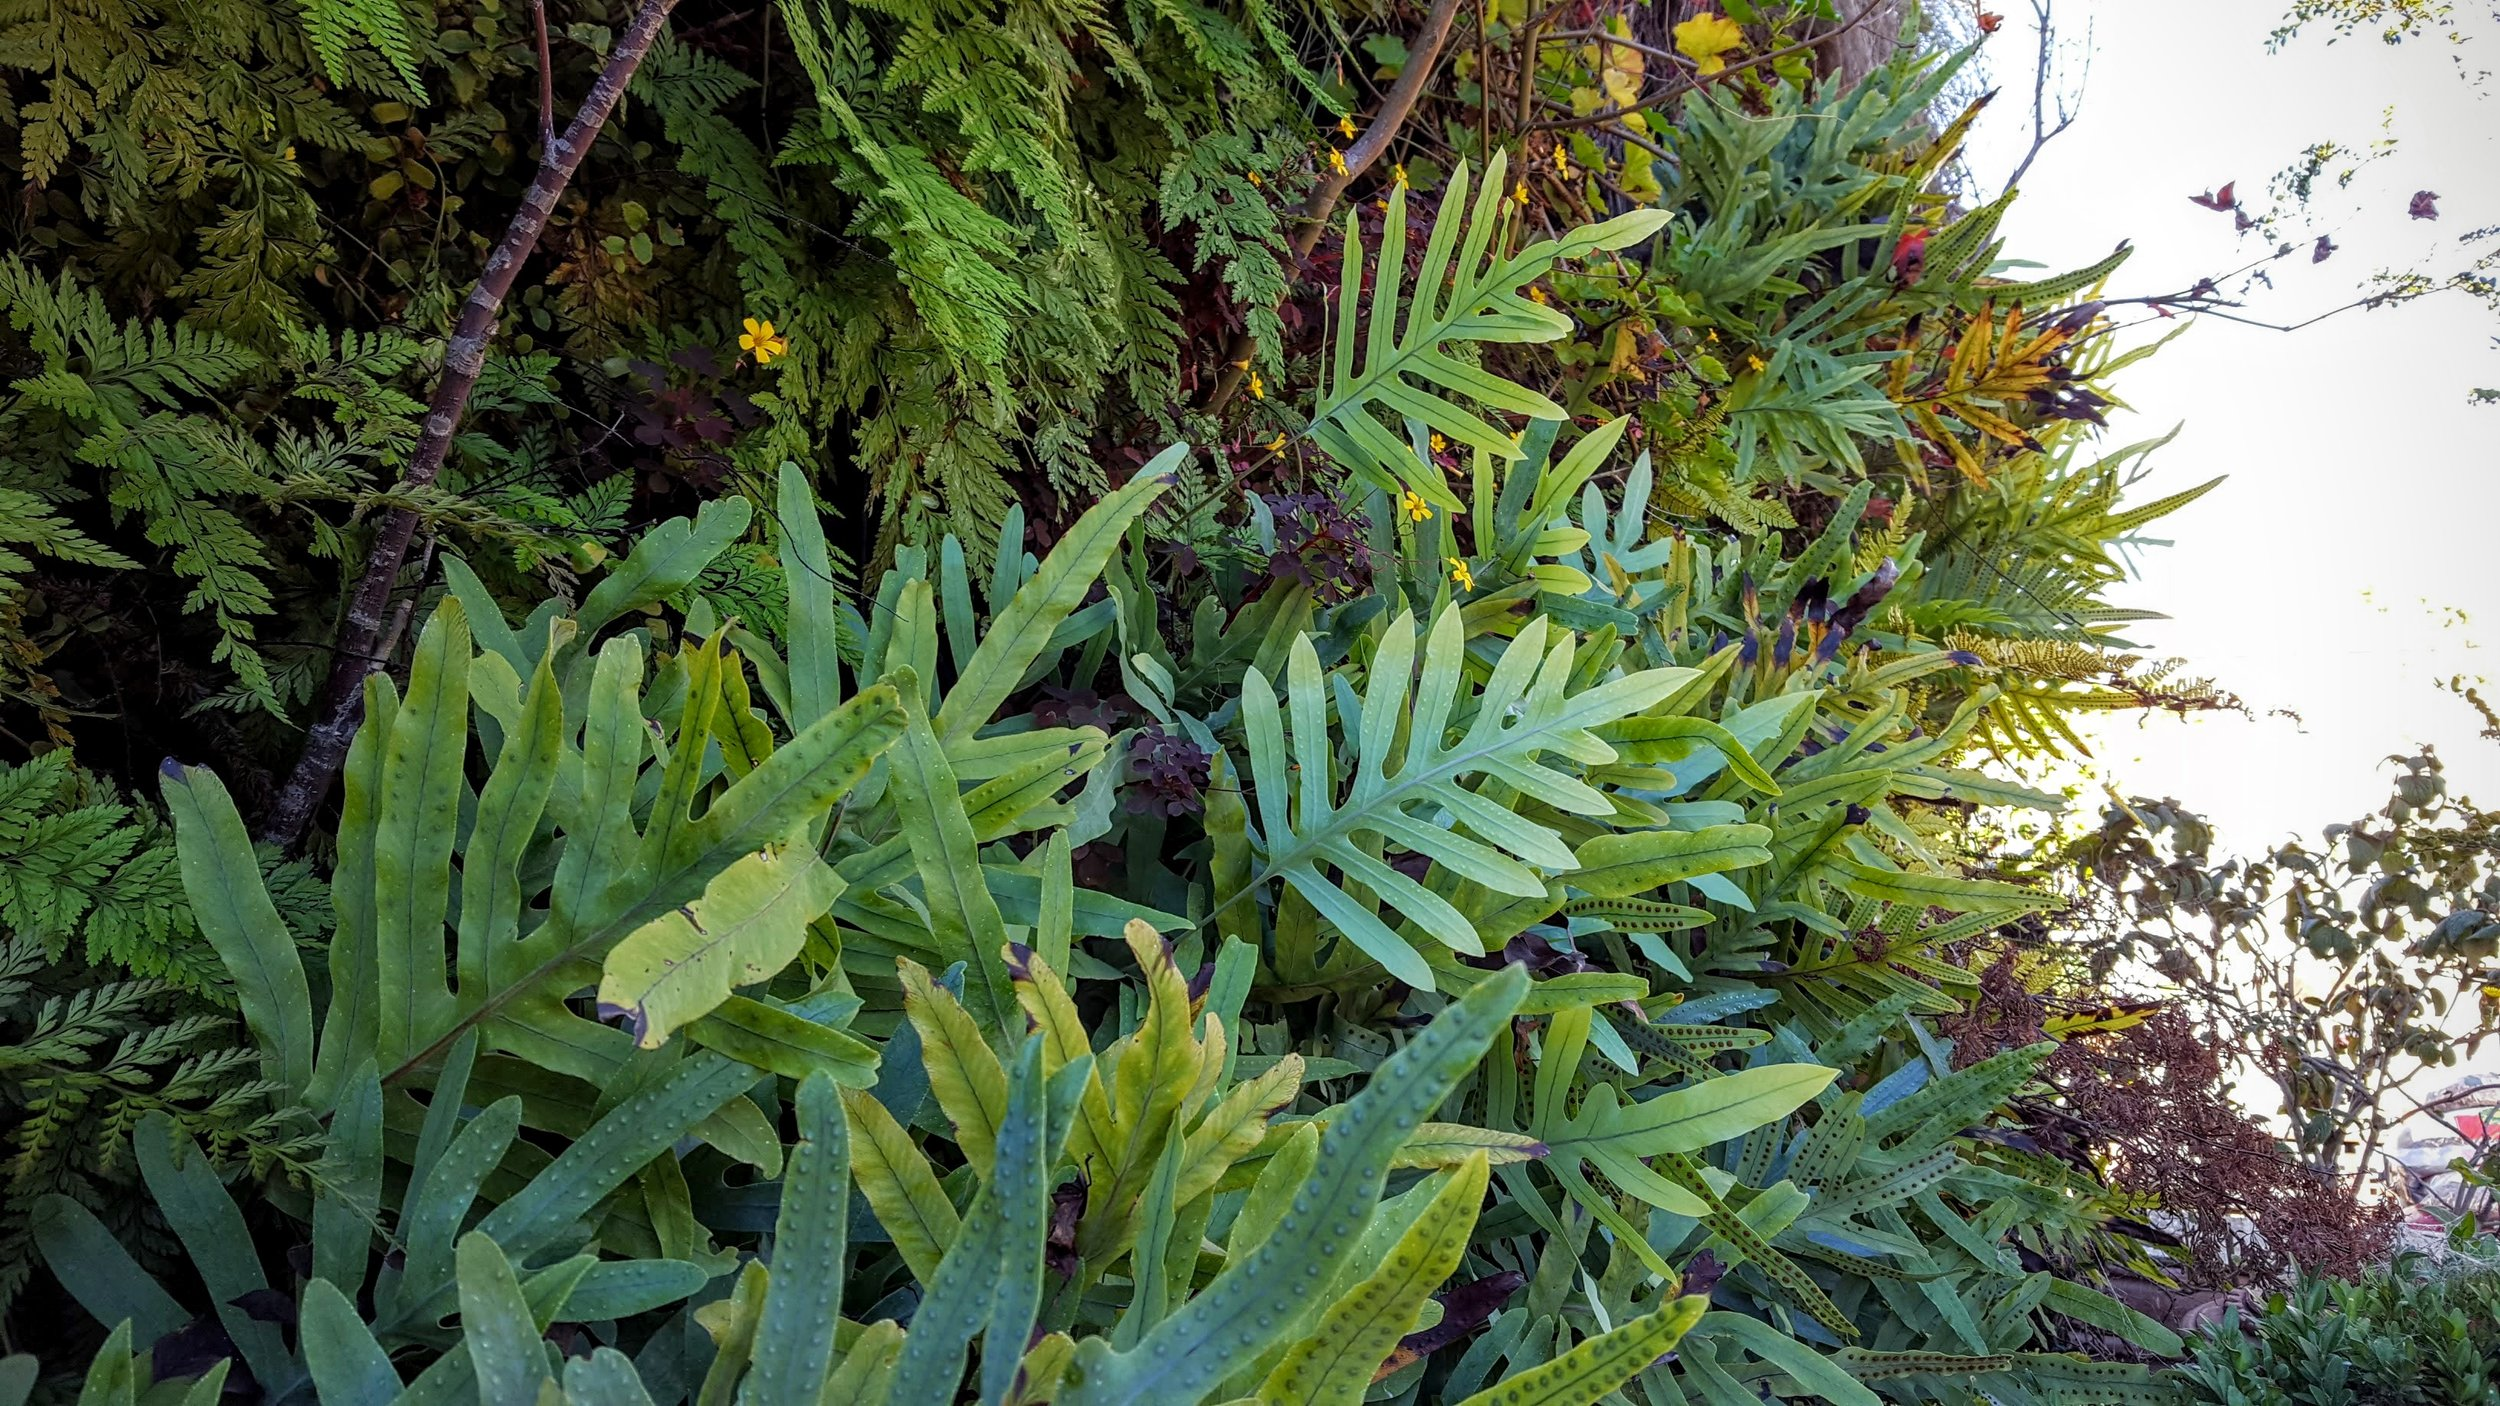 Florafelt-Pro-System-Vertical-Garden-Brandon-Pruett-Living-Walls-Living-Green-Design-20161108_092925.jpg